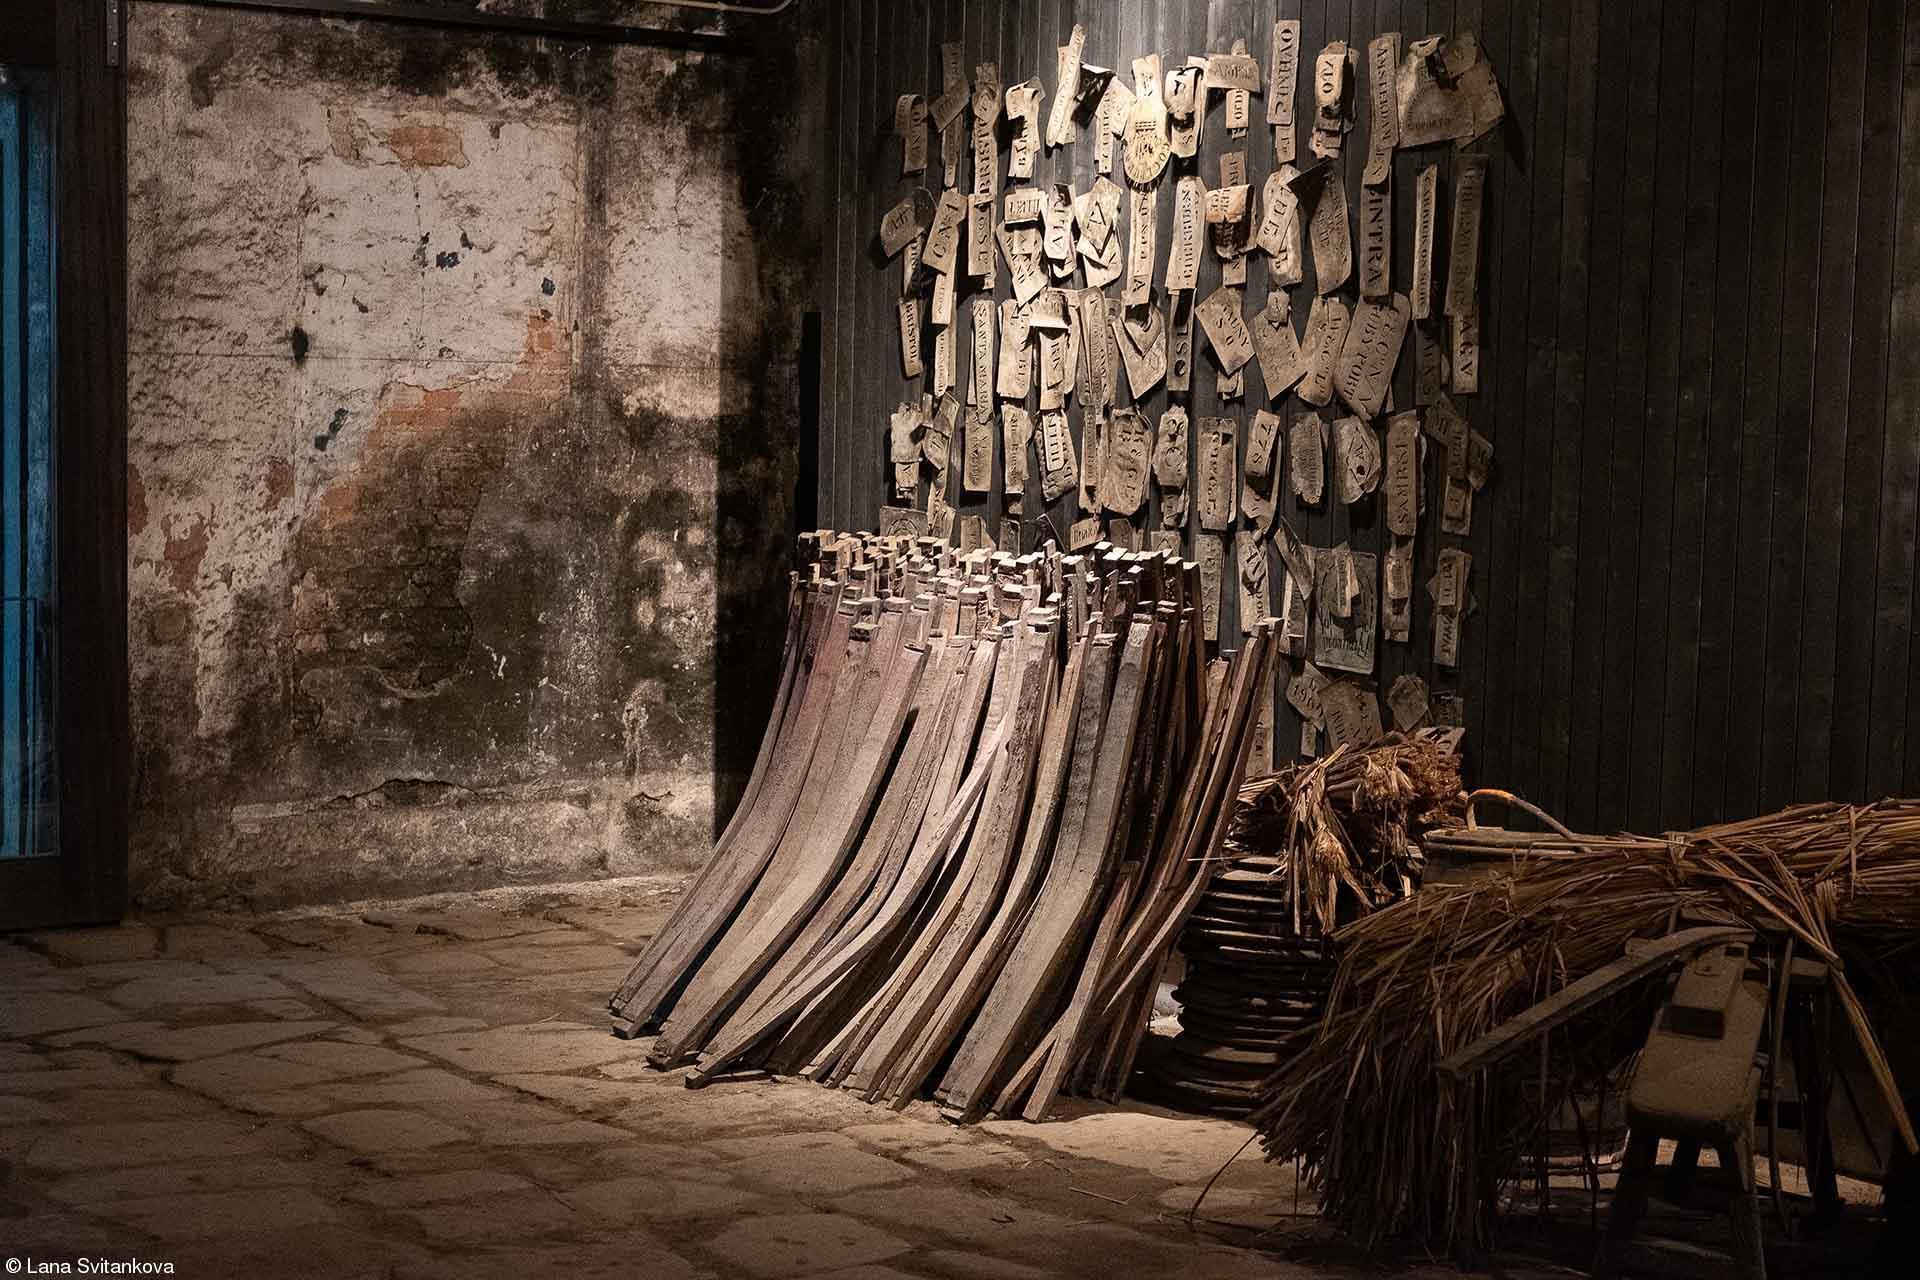 Errazuriz Places - Lana Svitankova The vanishing Craft